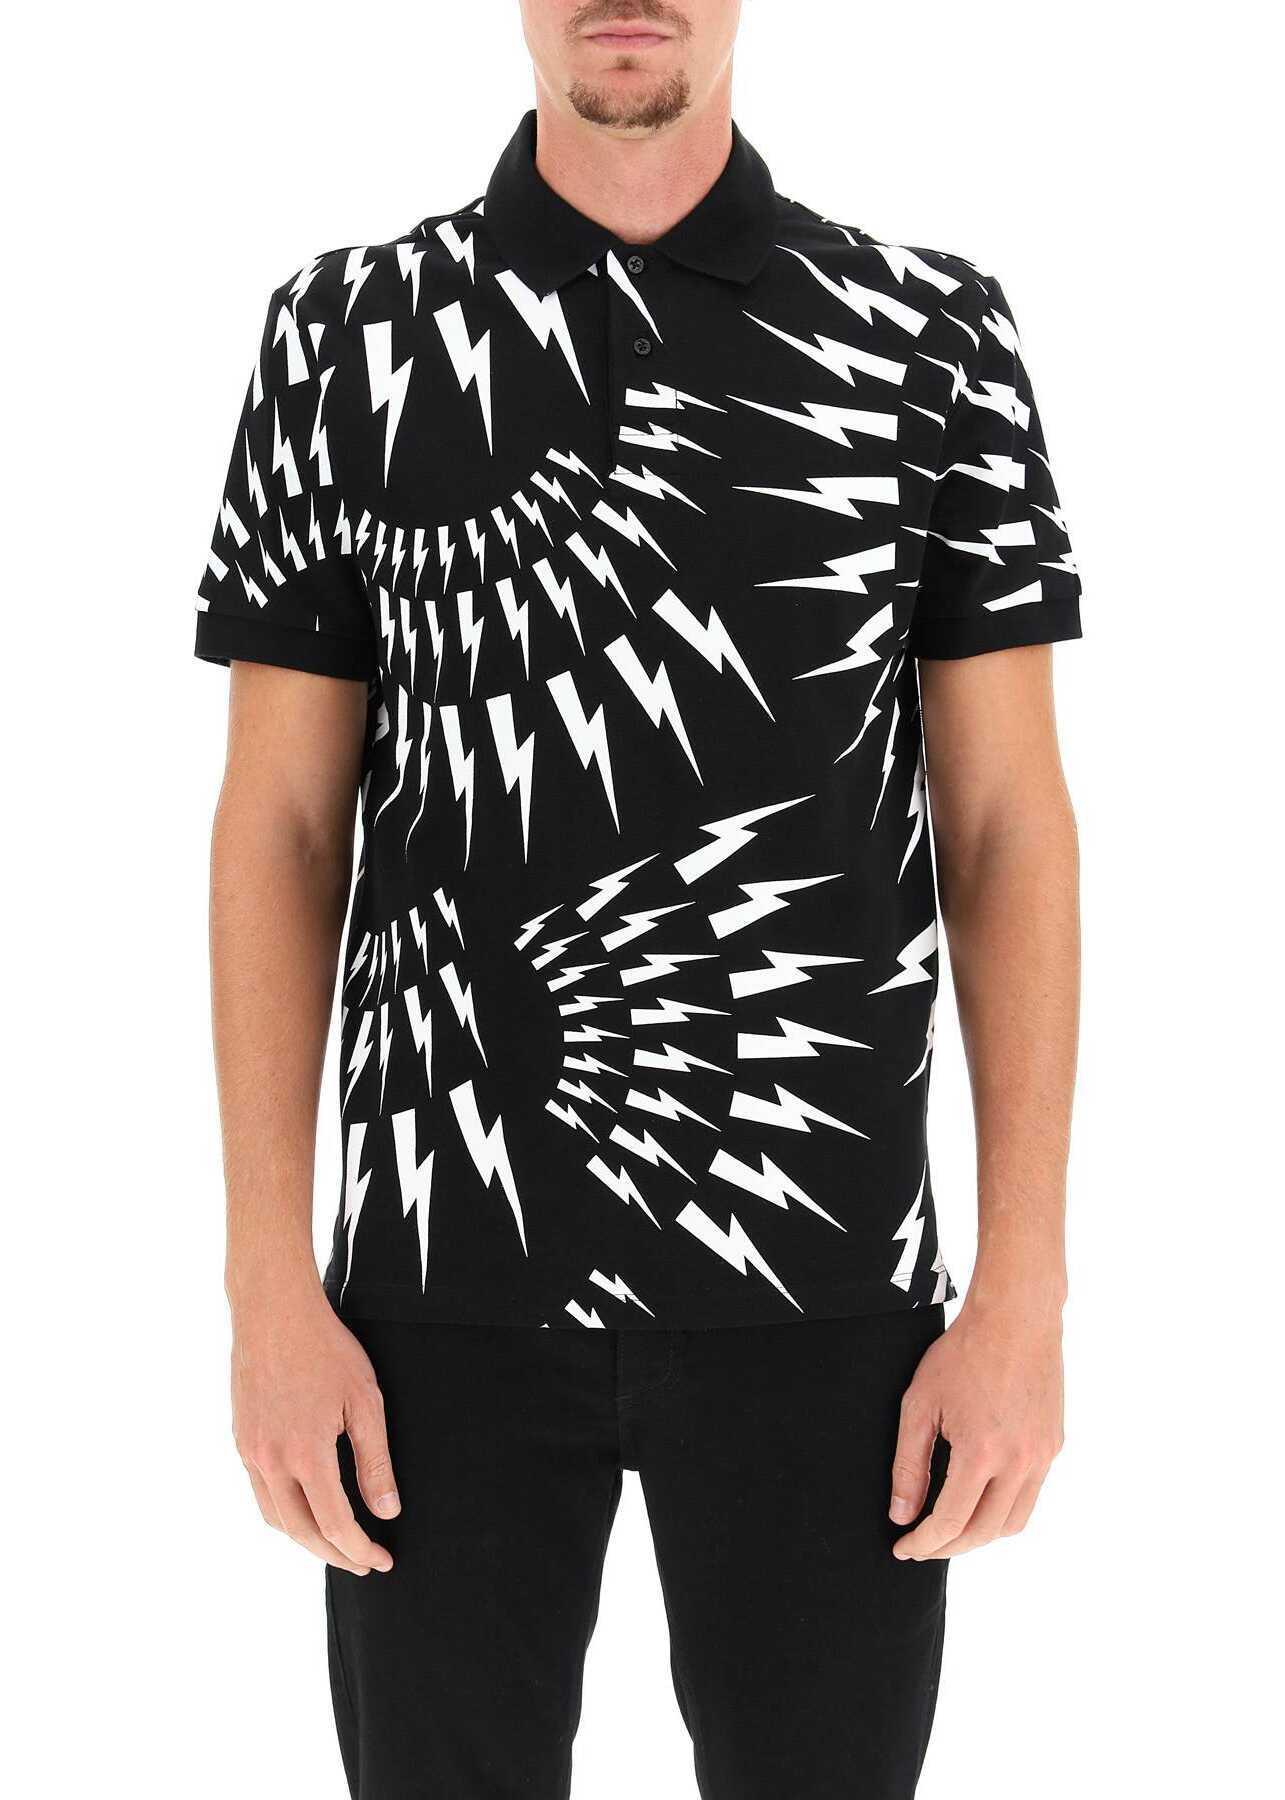 Neil Barrett Crazy Bolts Polo Shirt BJT010S R535S BLACK WHITE image0